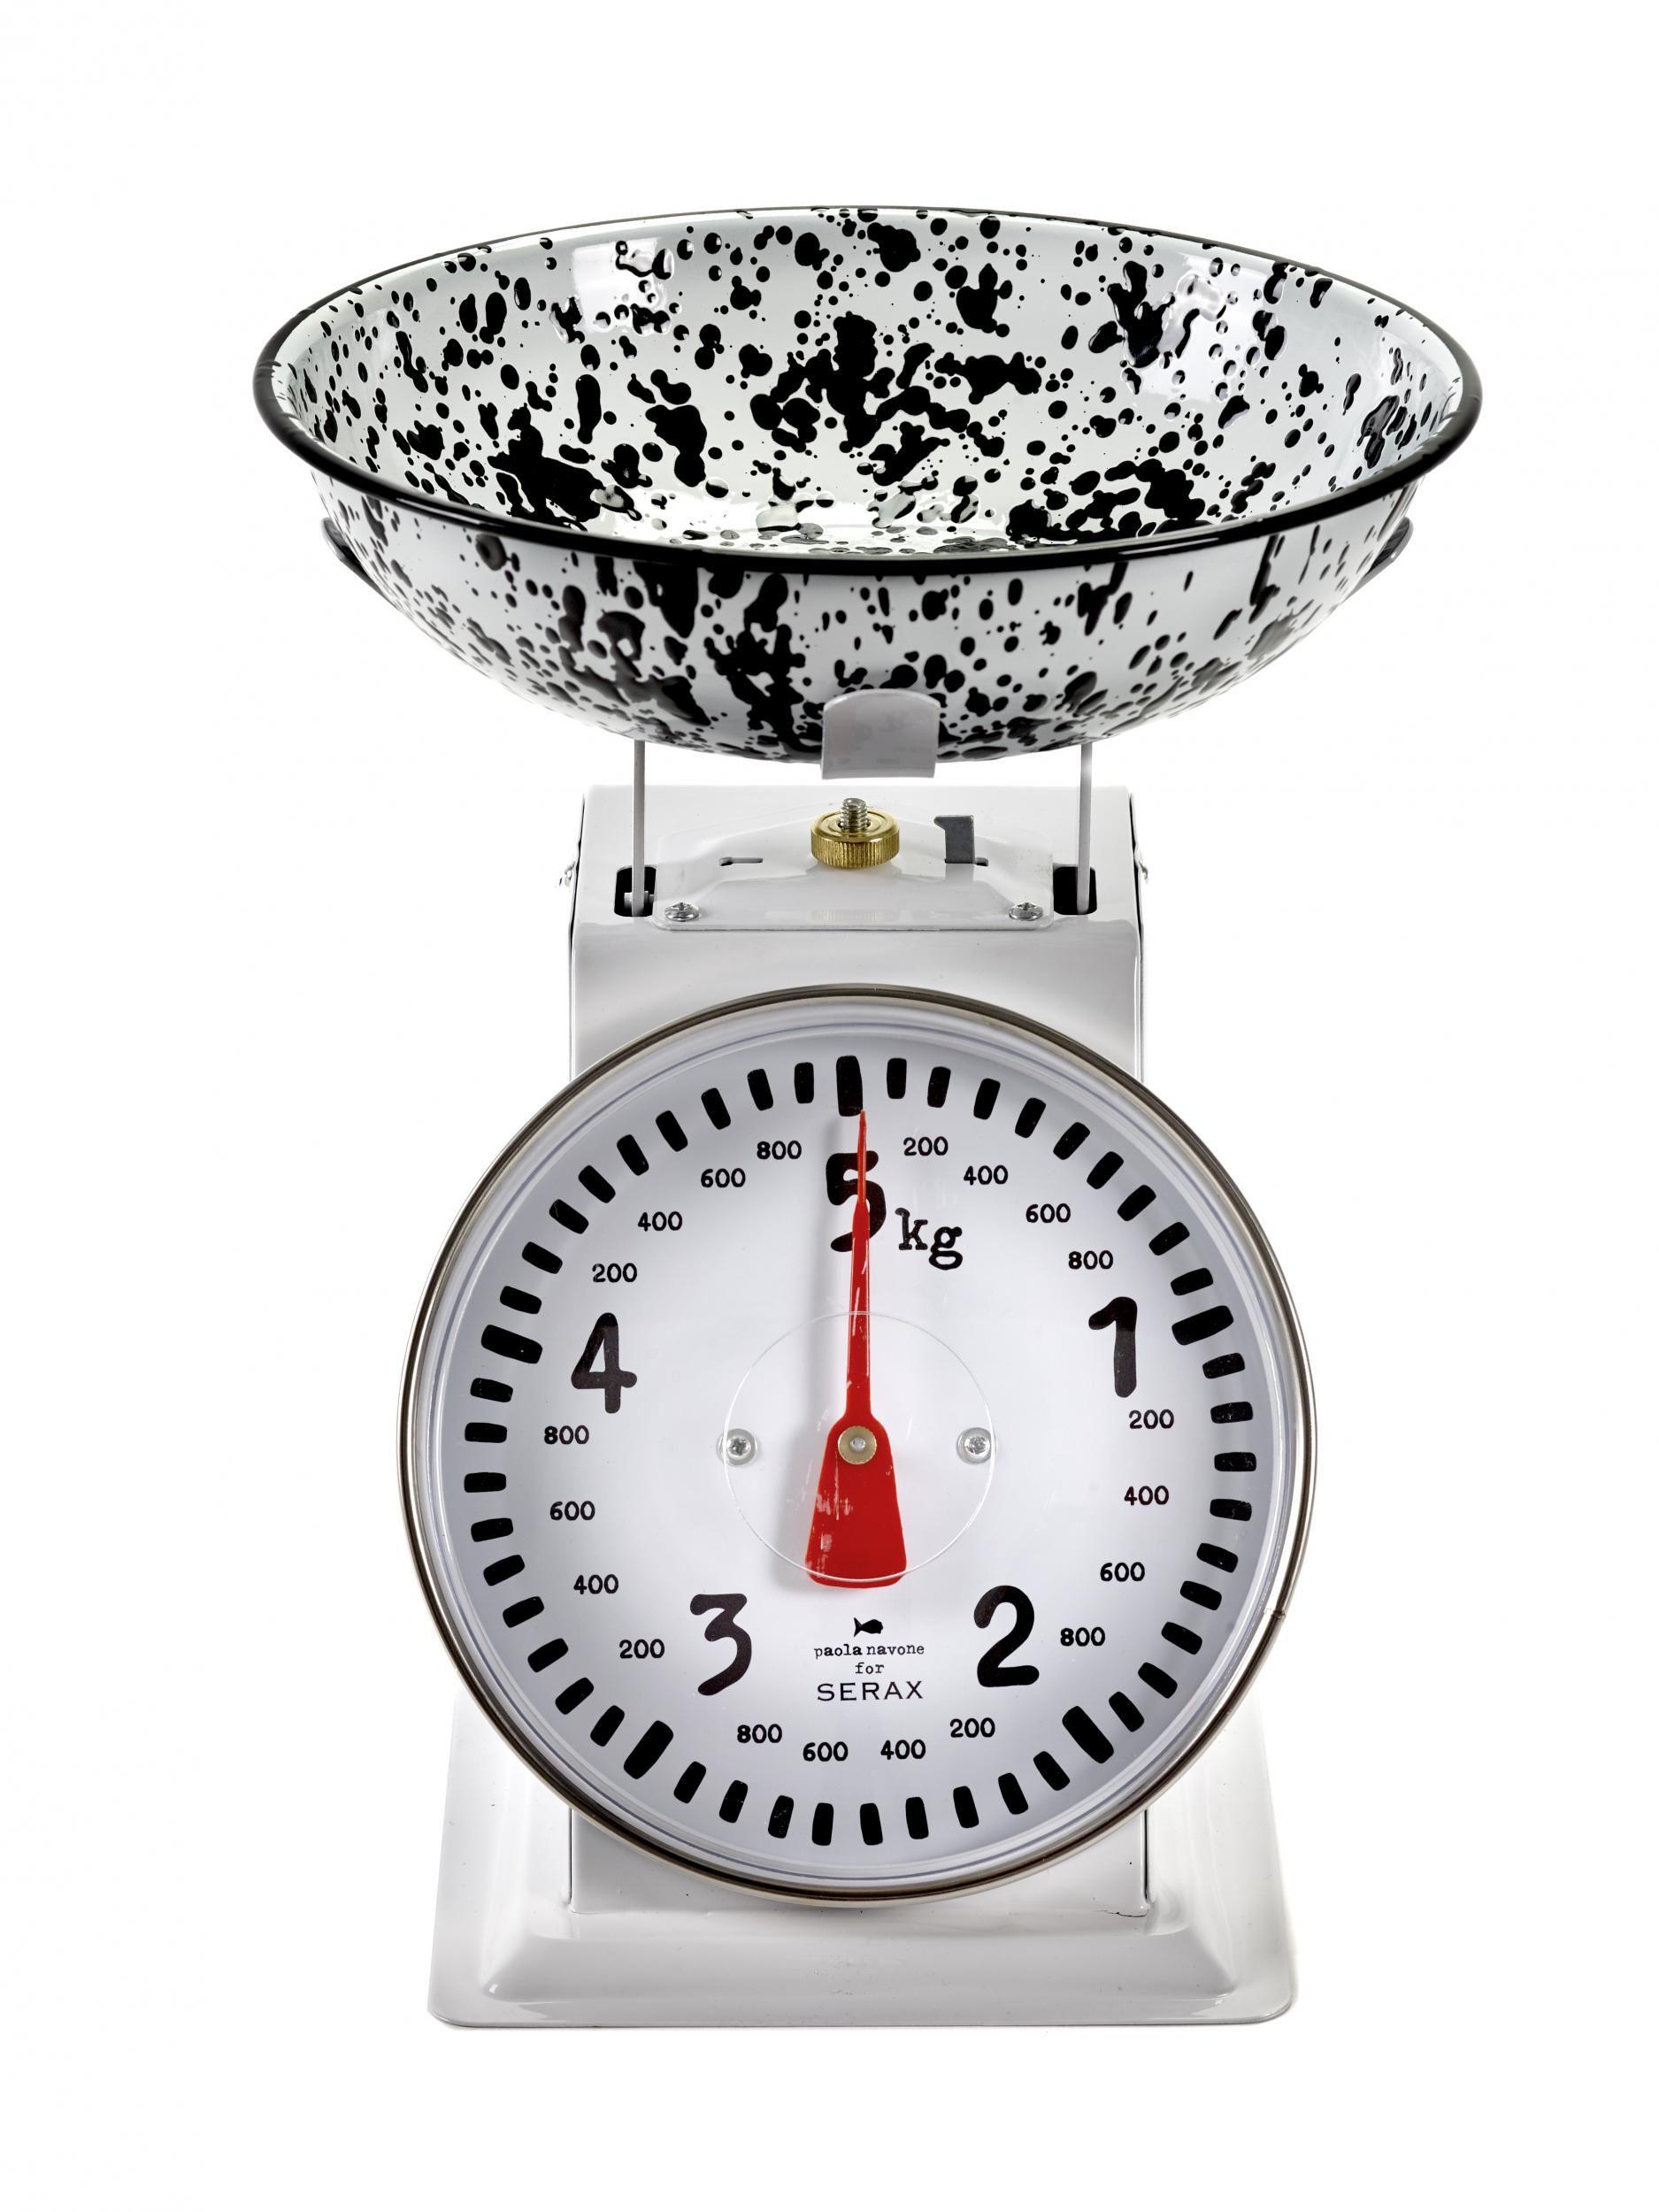 balance de cuisine m canique pasta pasta serax noir blanc h 30 made in design. Black Bedroom Furniture Sets. Home Design Ideas